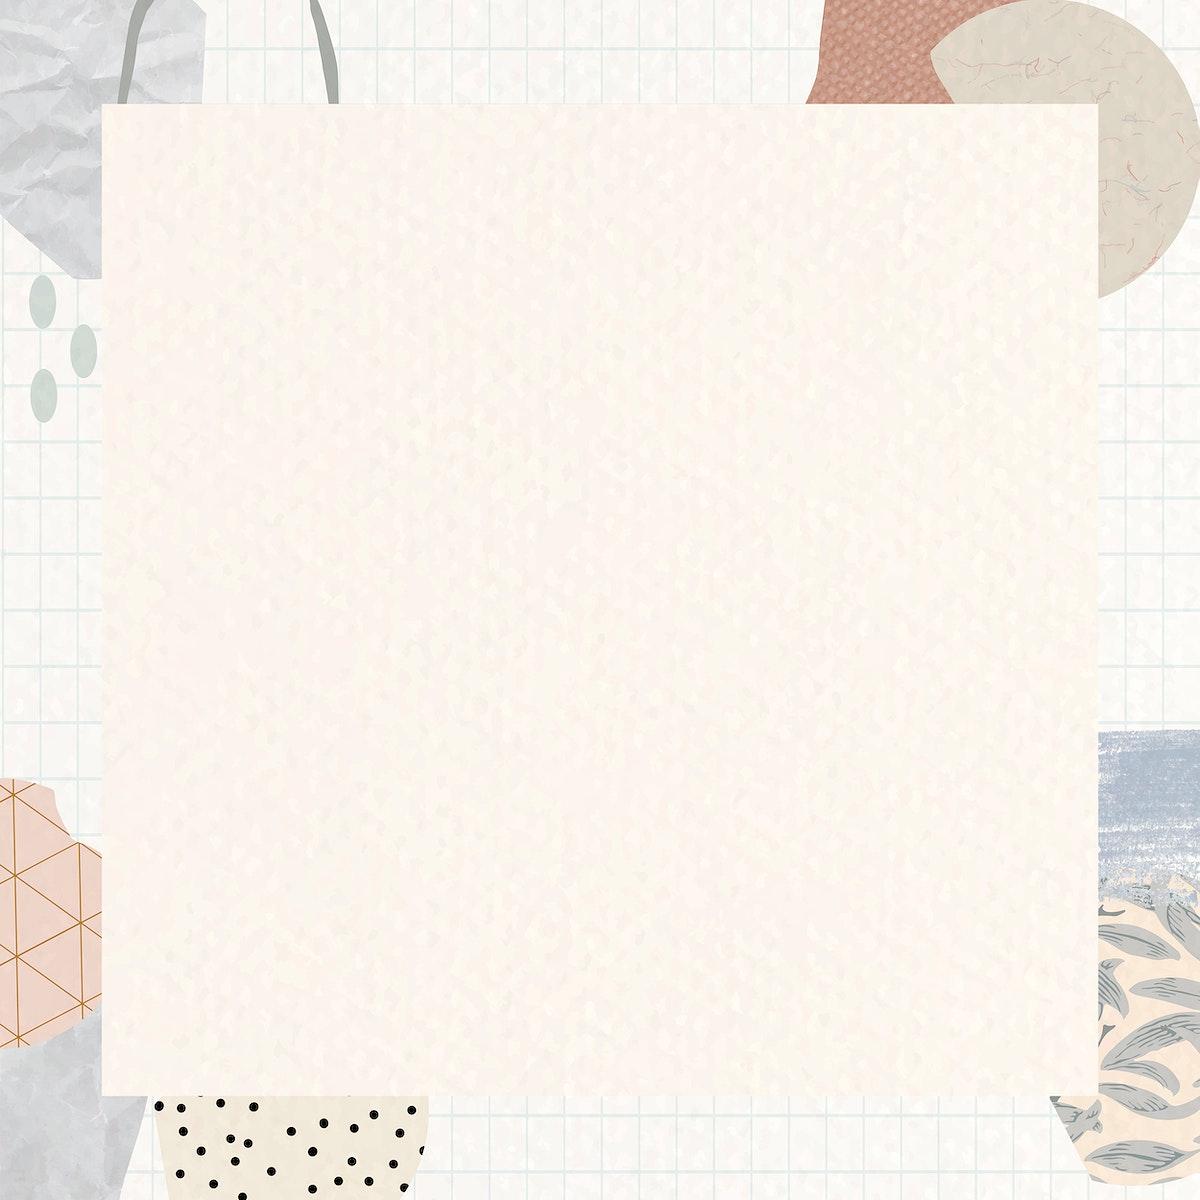 Terrazzo frame on beige background vector